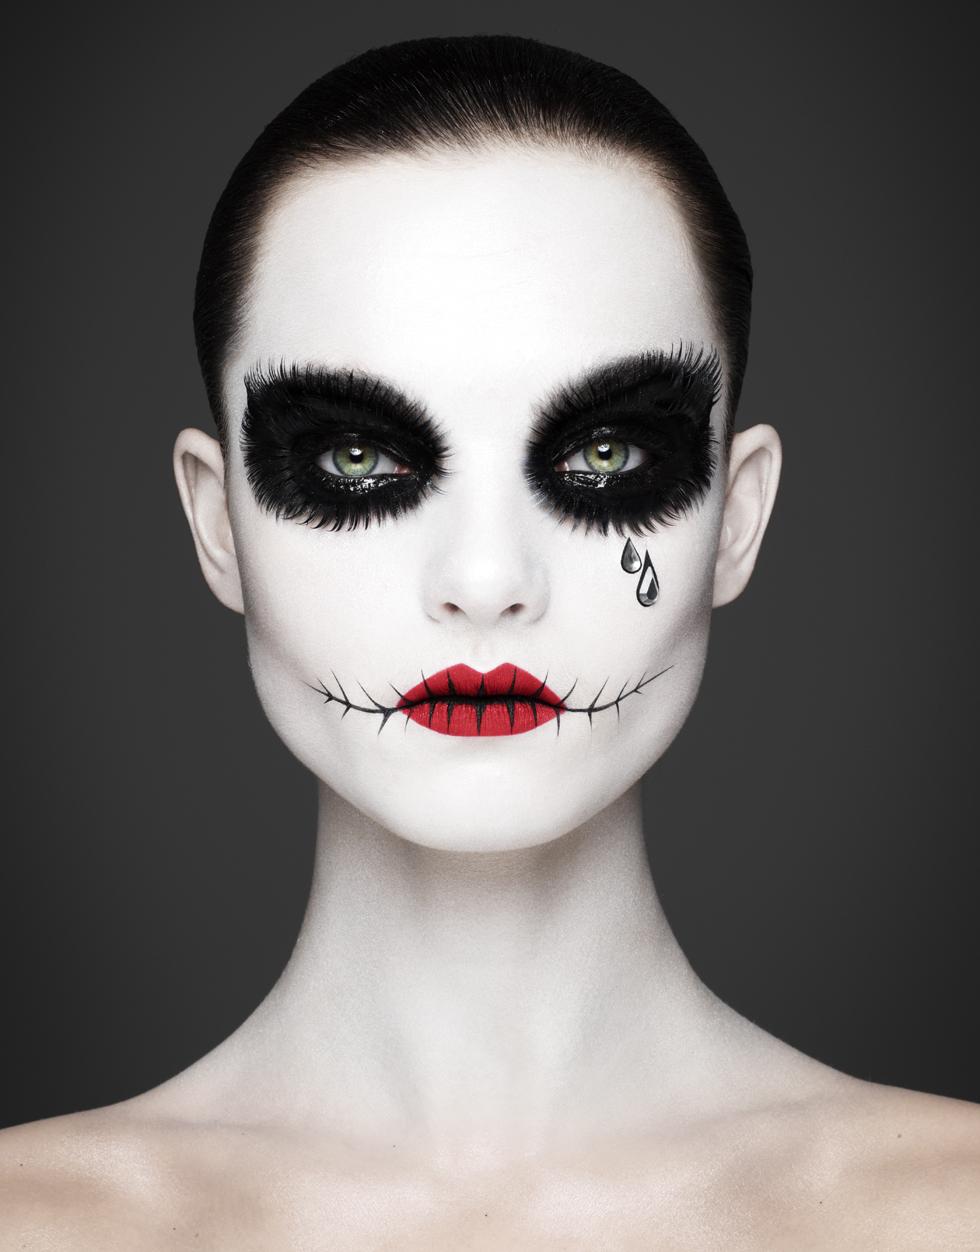 andrew-gallimore-diadelasmuertes-masks-02